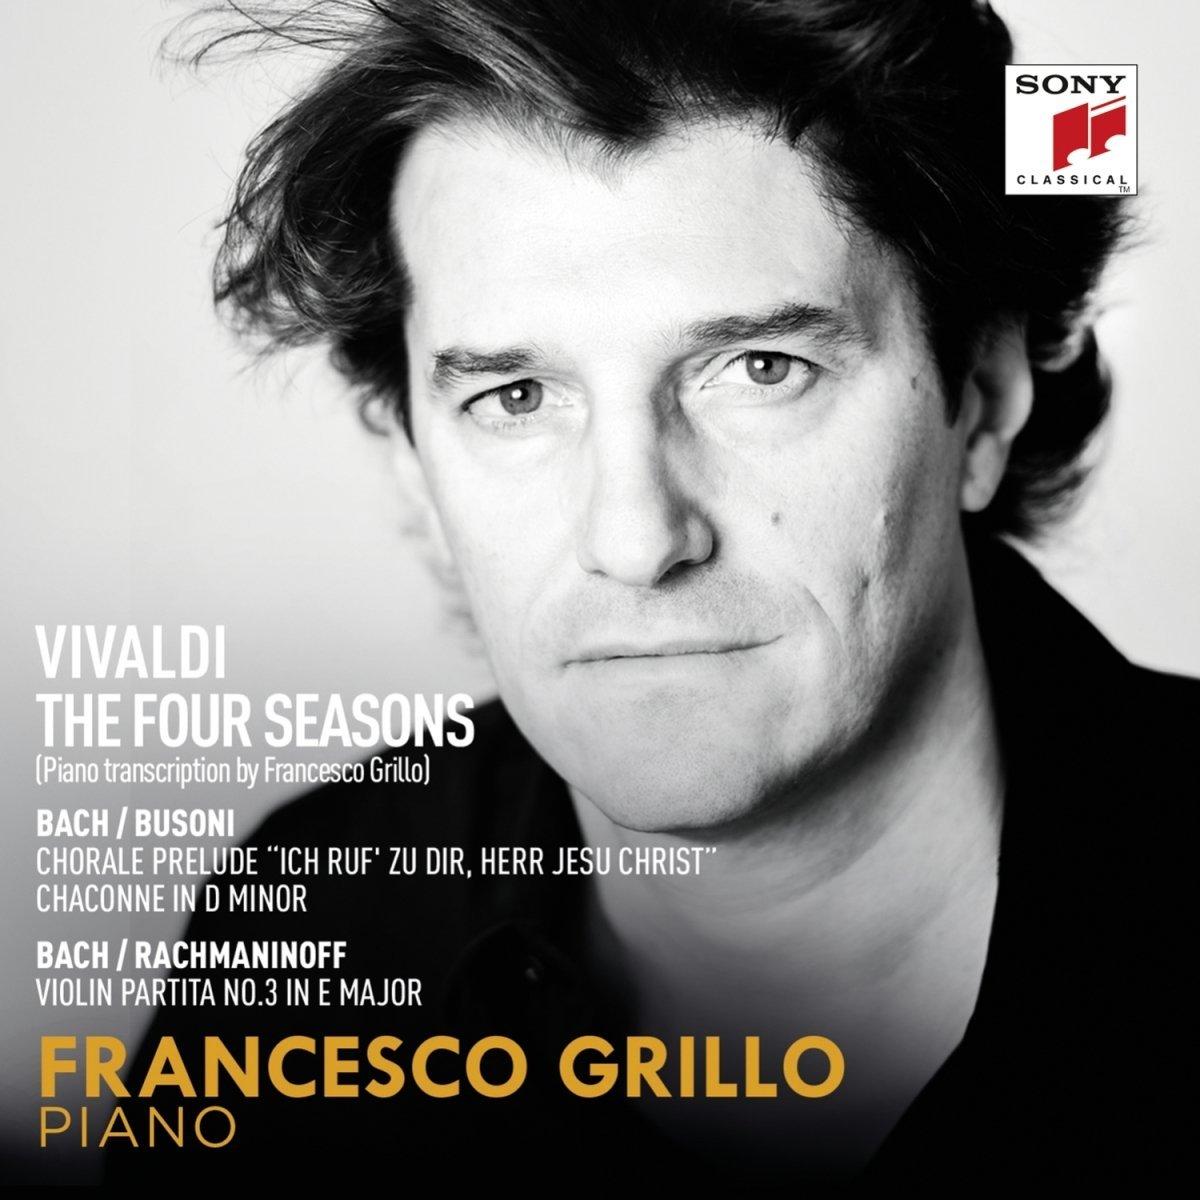 The Four Seasons Francesco Grillo